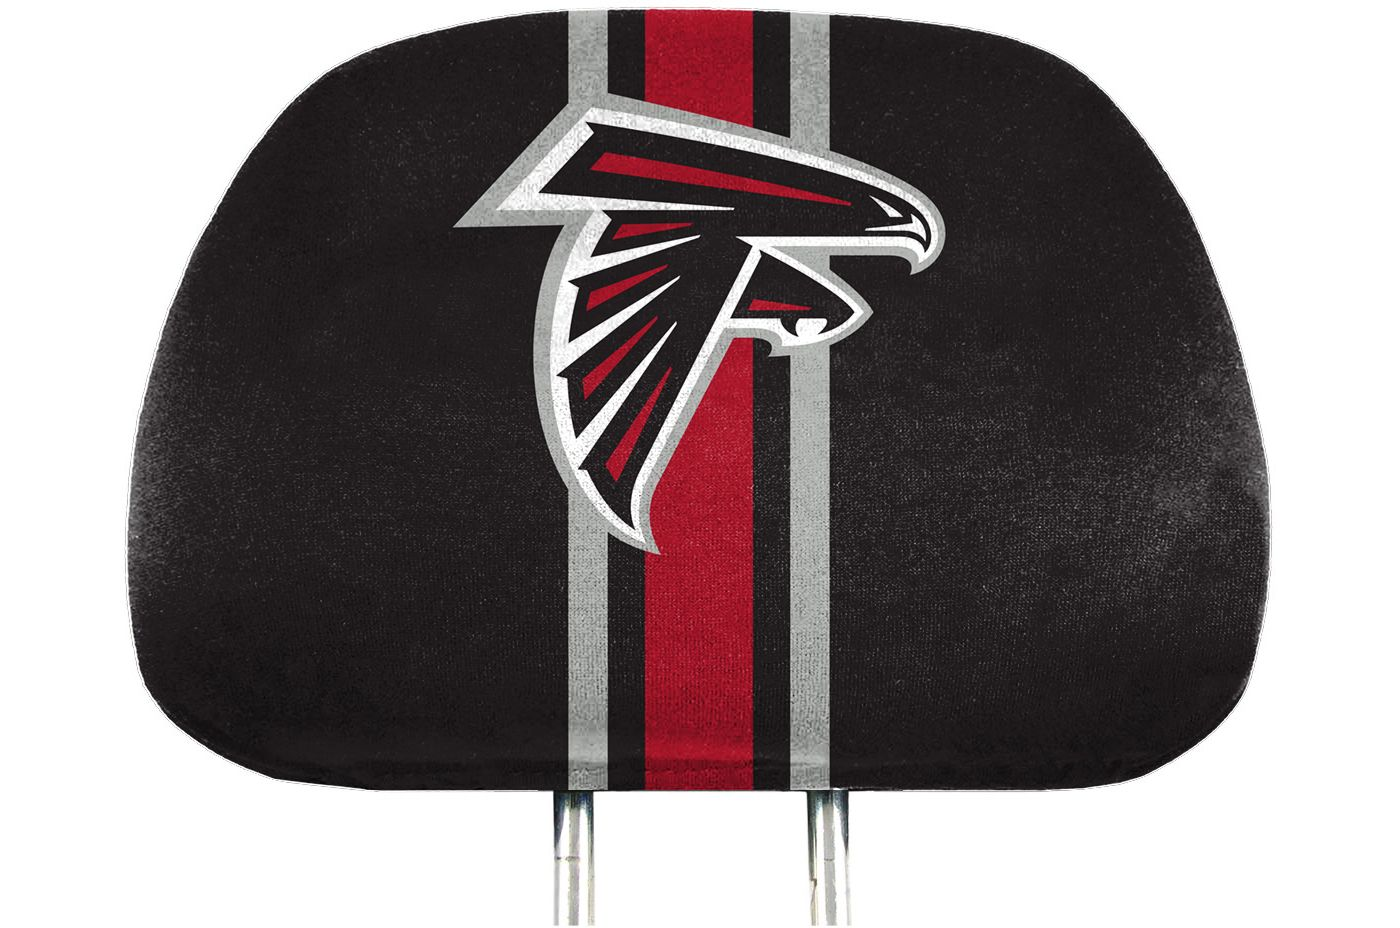 Team Promark Atlanta Falcons Printed Headrest Cover